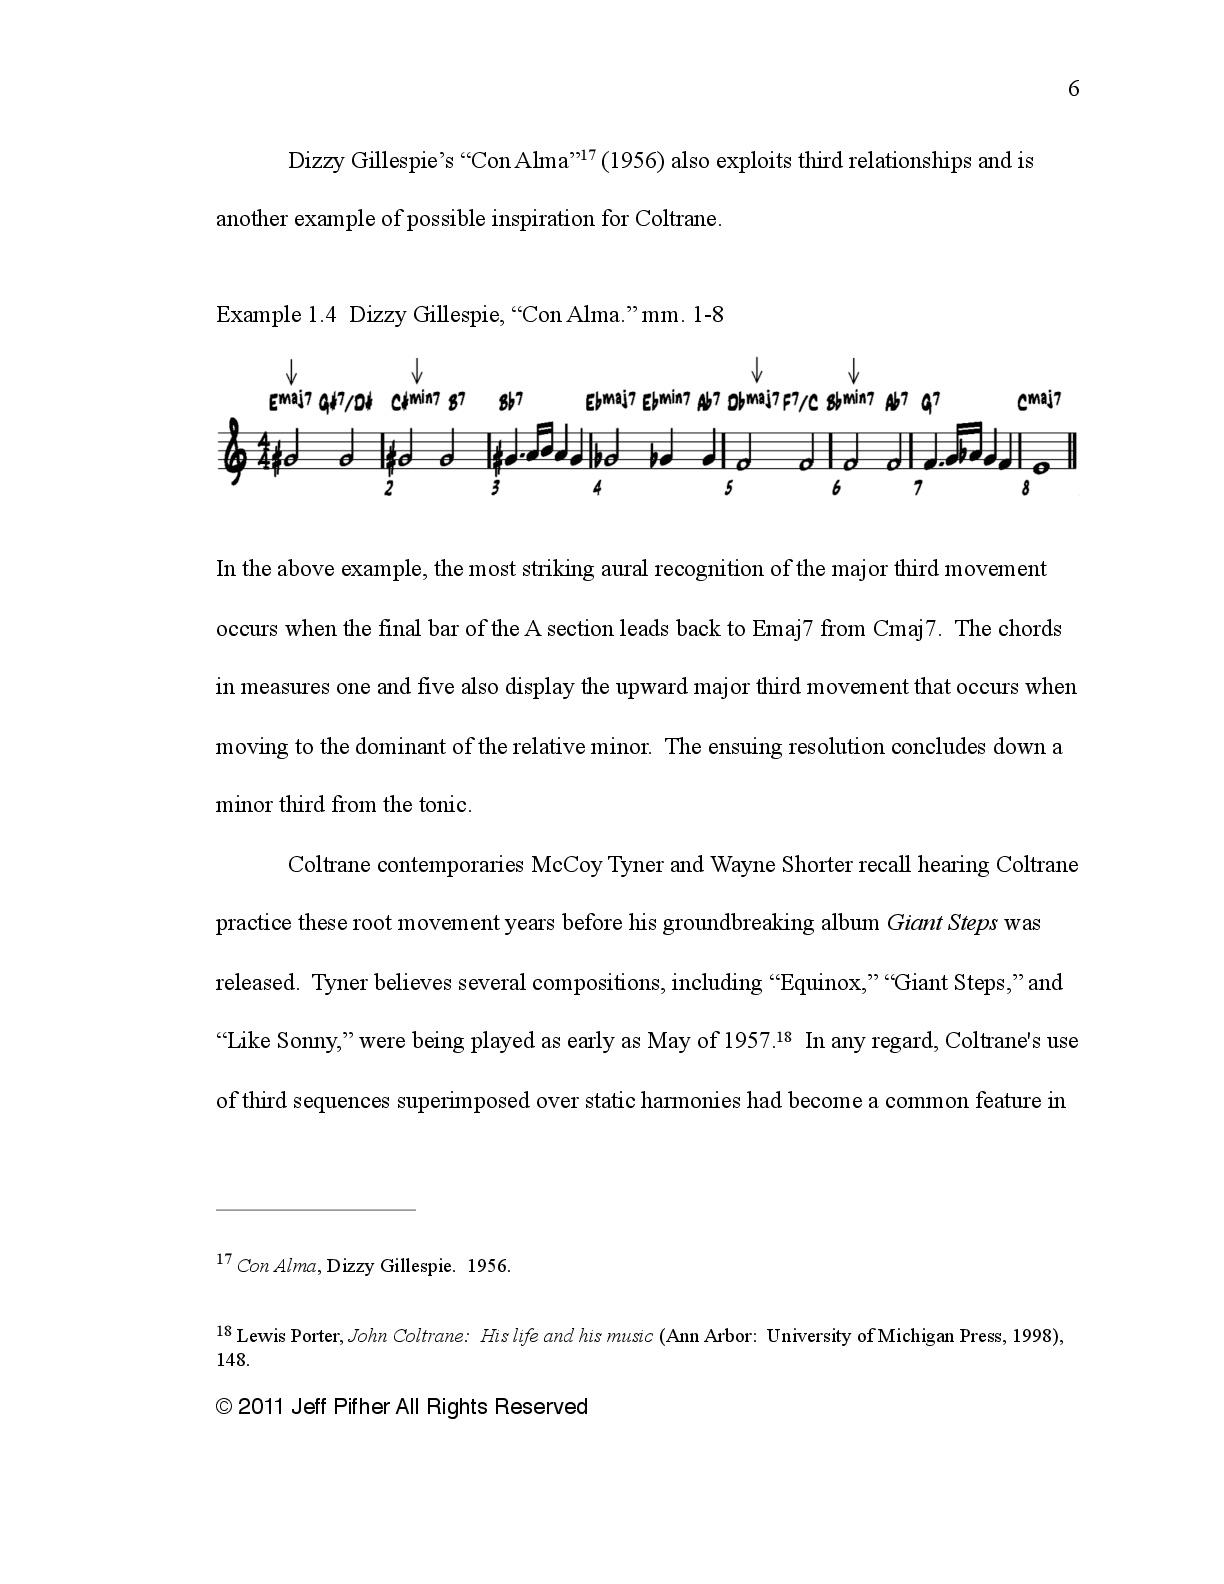 Jeff-Pifher-Academic-Series-Coltrane-Cycles-006.jpg